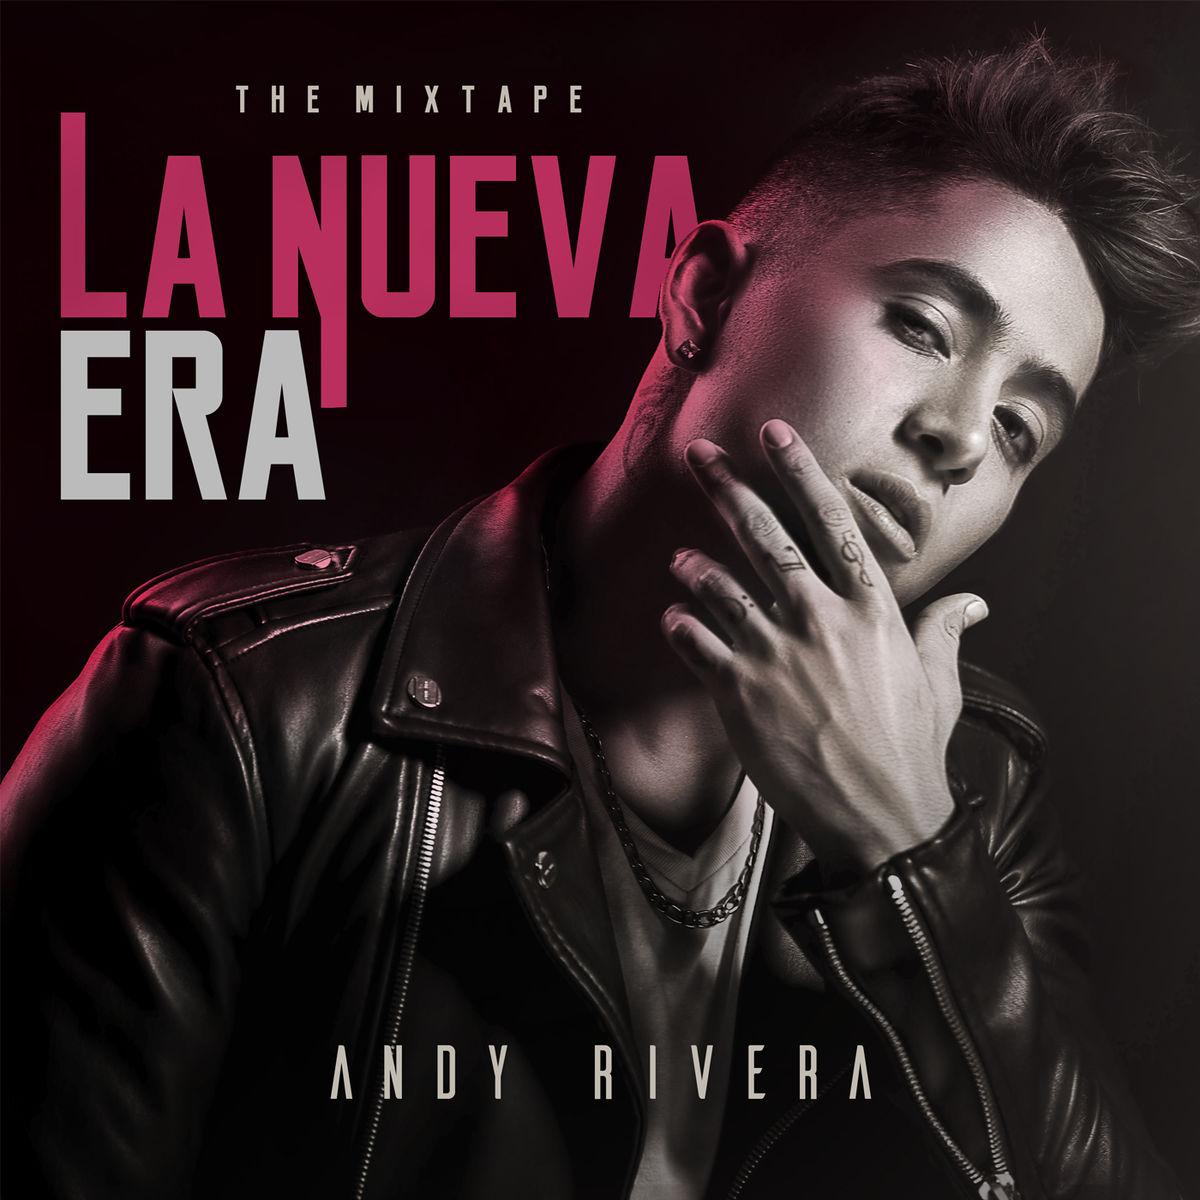 La nueva era: The mixtape